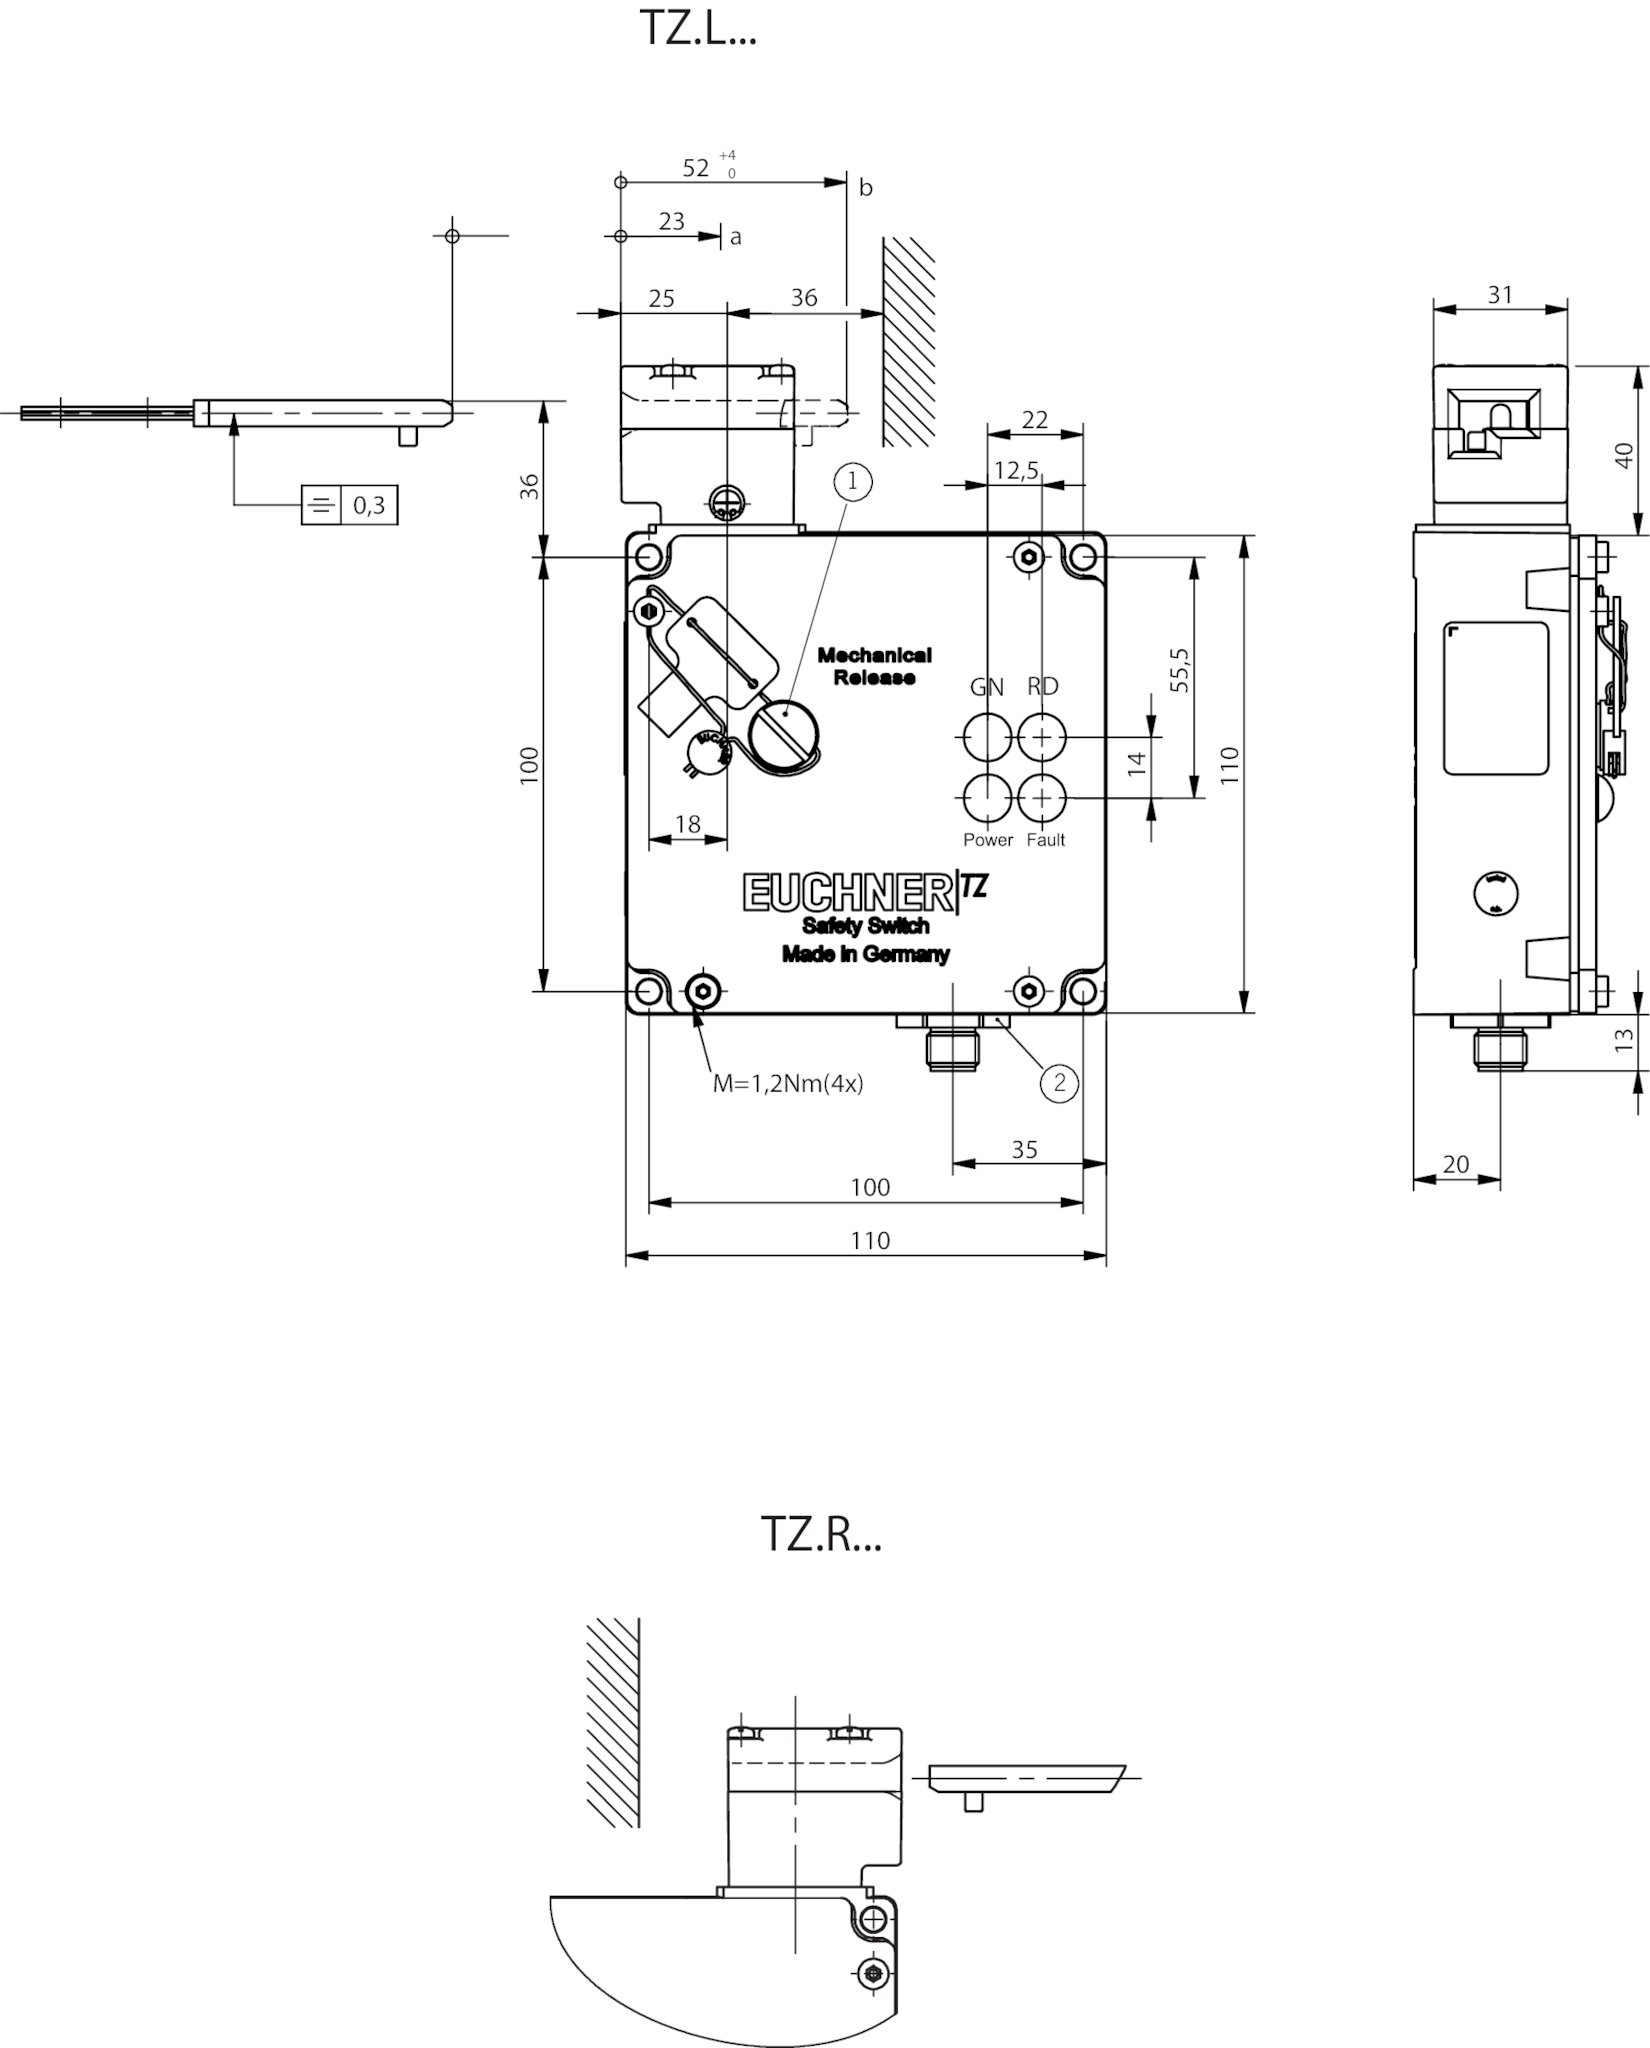 Euchner TZ1LE024SEM4AS1-C1937 NEU